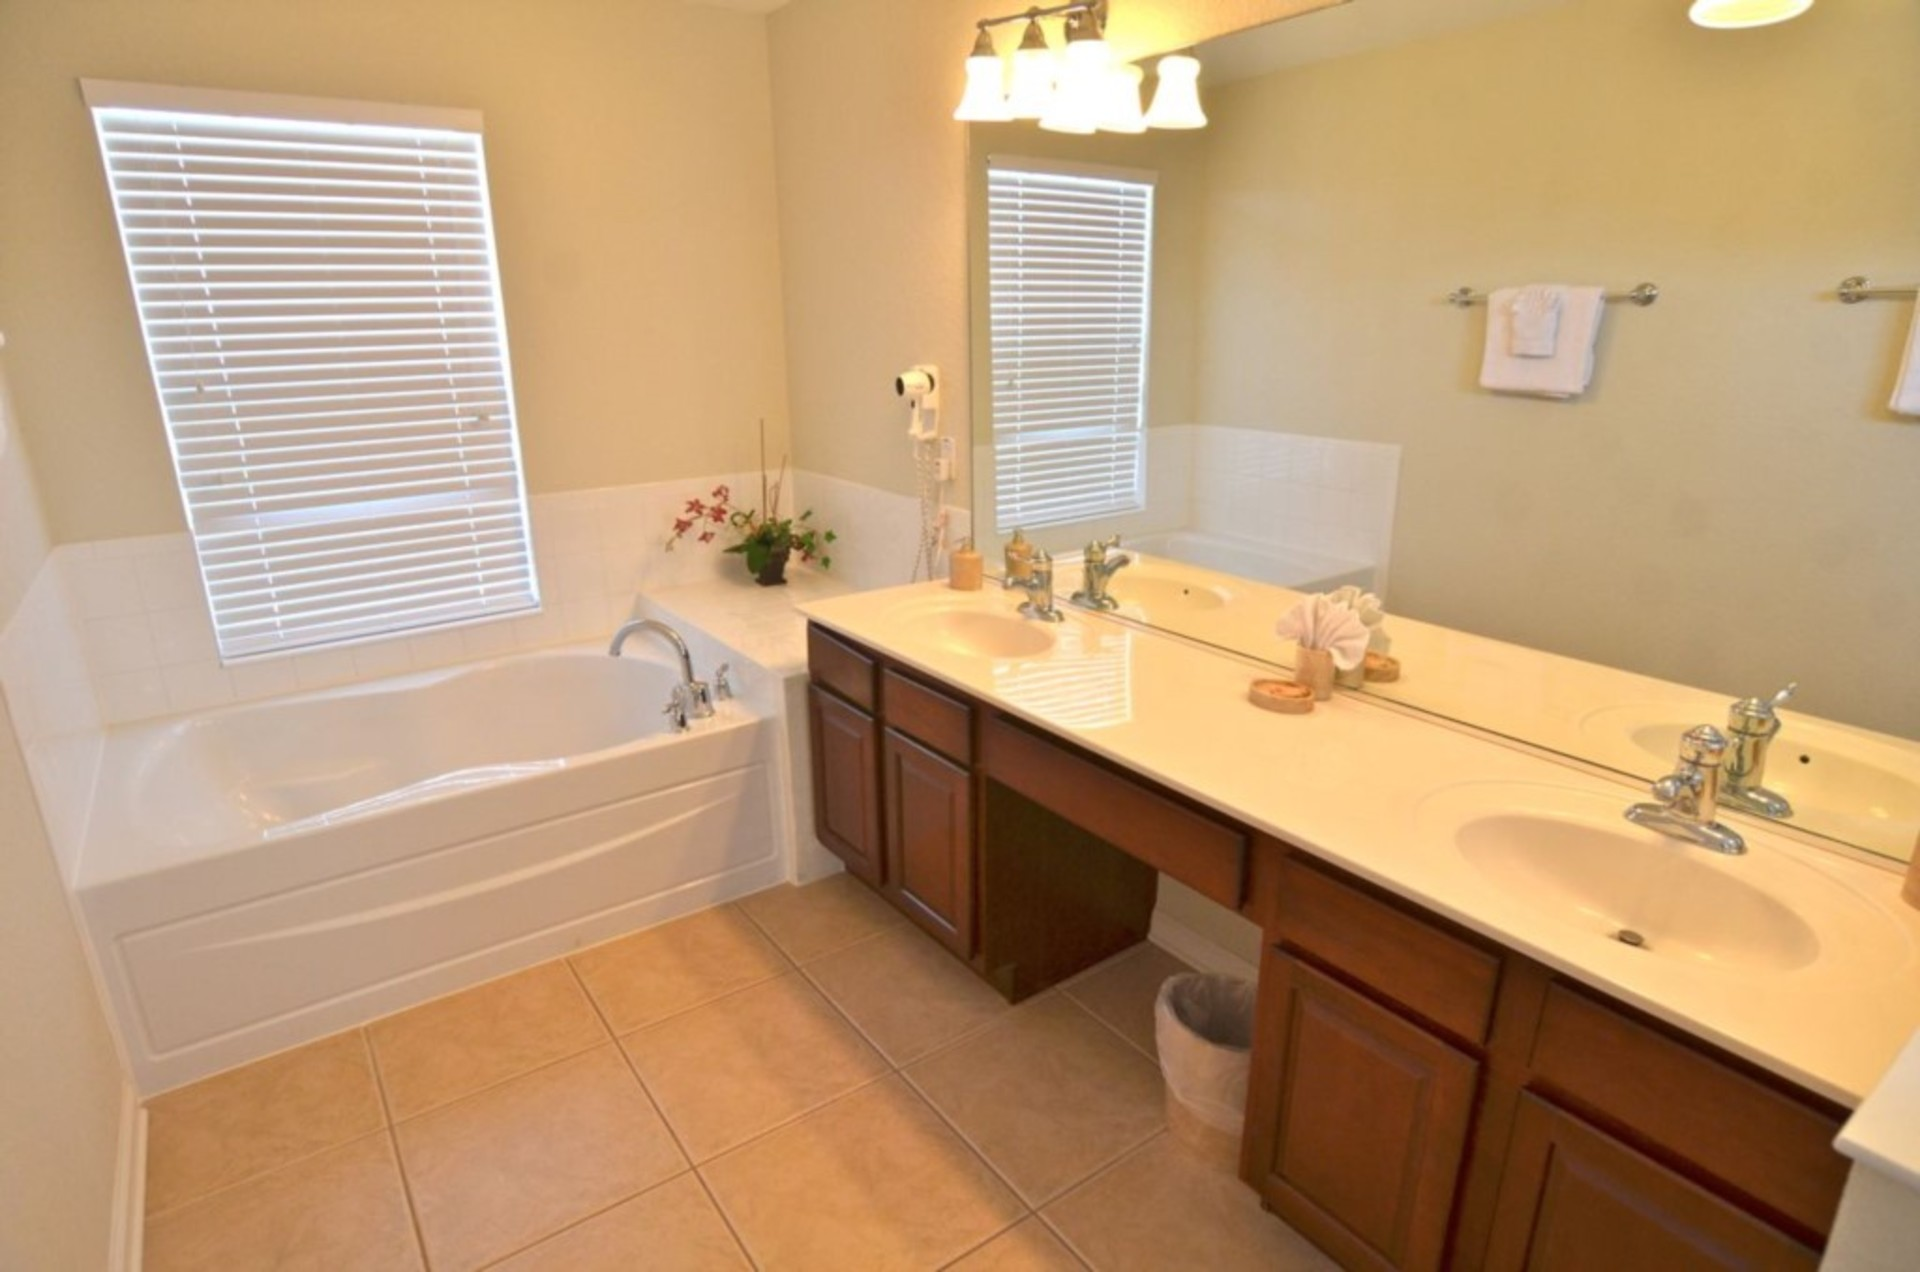 Enjoy a 5 Star Villa Holiday with your Family, Windsor Hills Resort, Villa Orlando 1459 photo 5803832